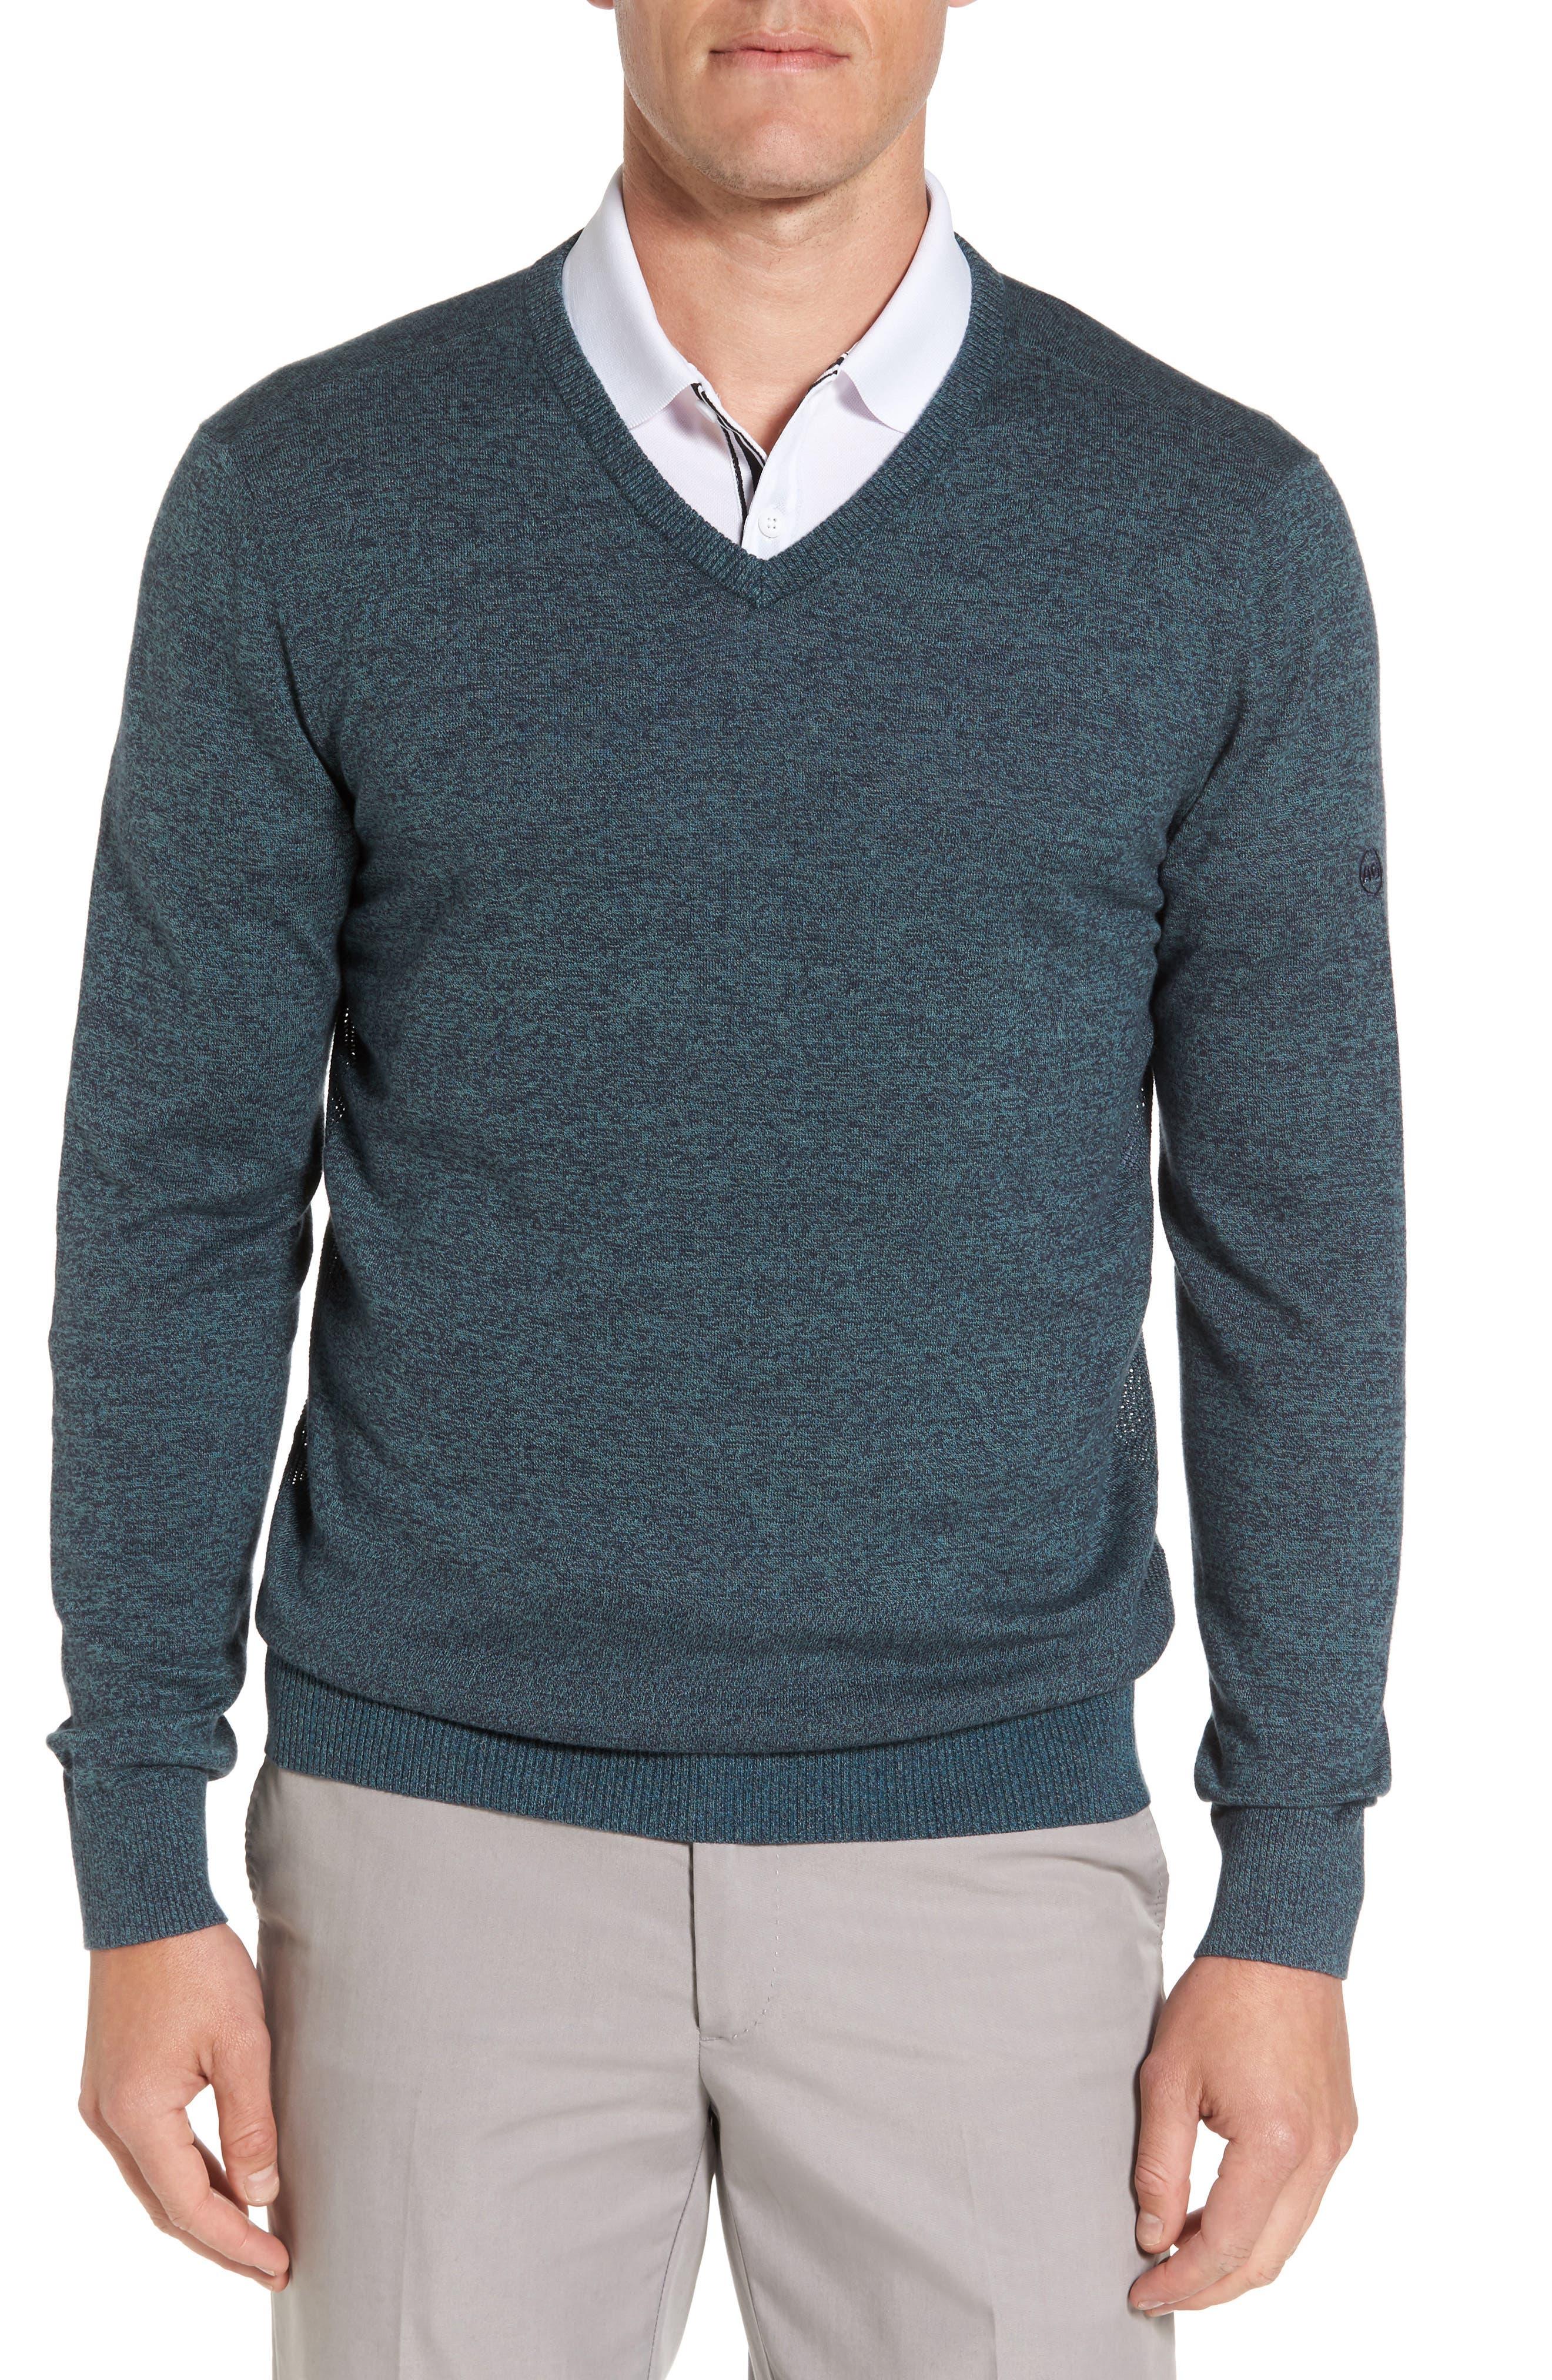 Ridgewood V-Neck Sweater,                             Main thumbnail 1, color,                             Turf/ Naval Blue Melange